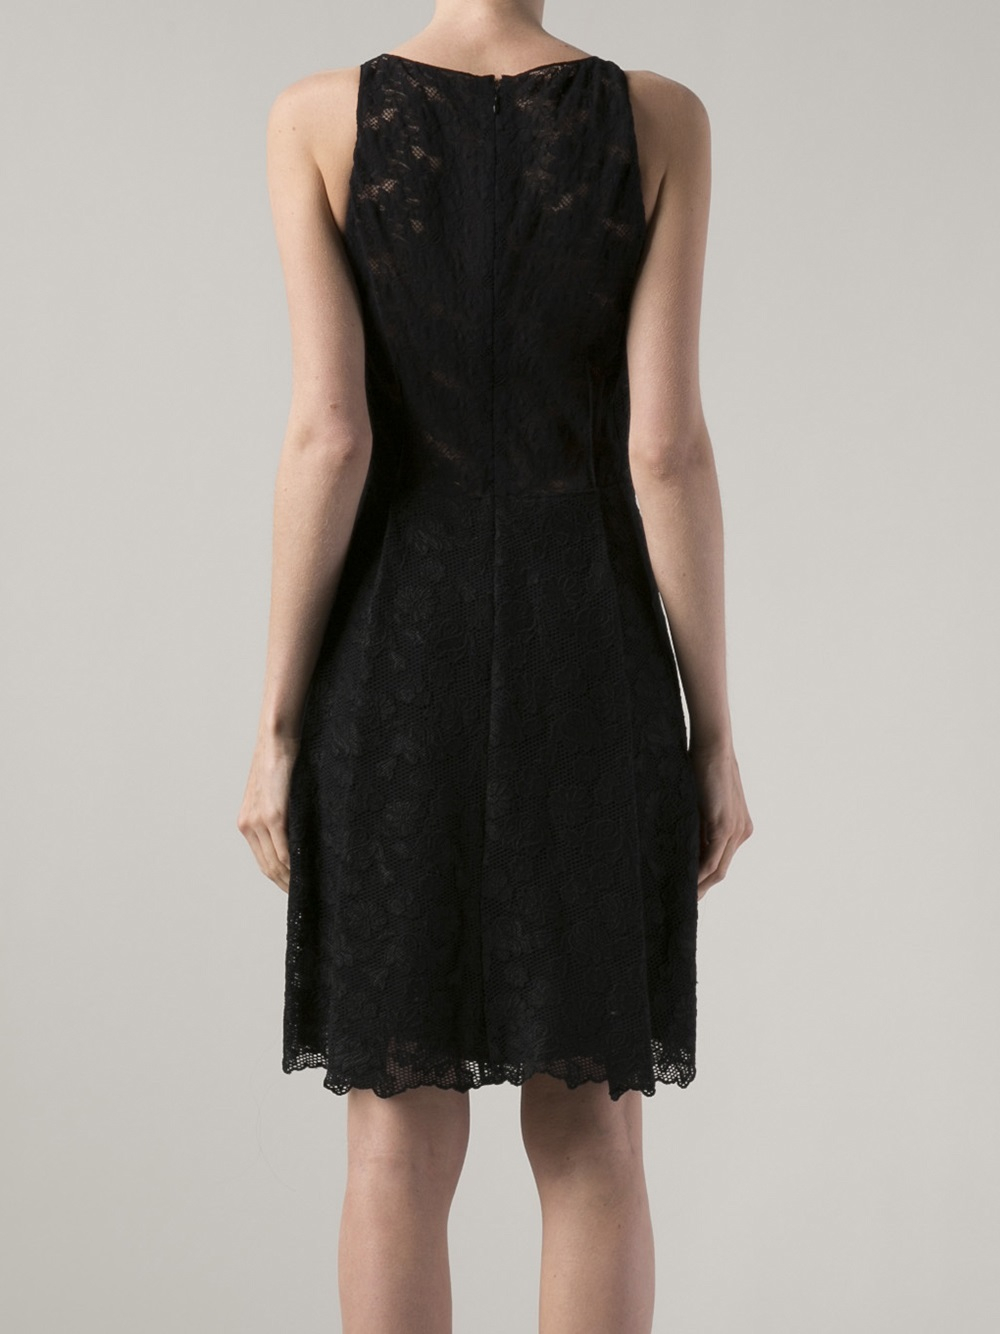 lyst nina ricci sleeveless lace dress in black